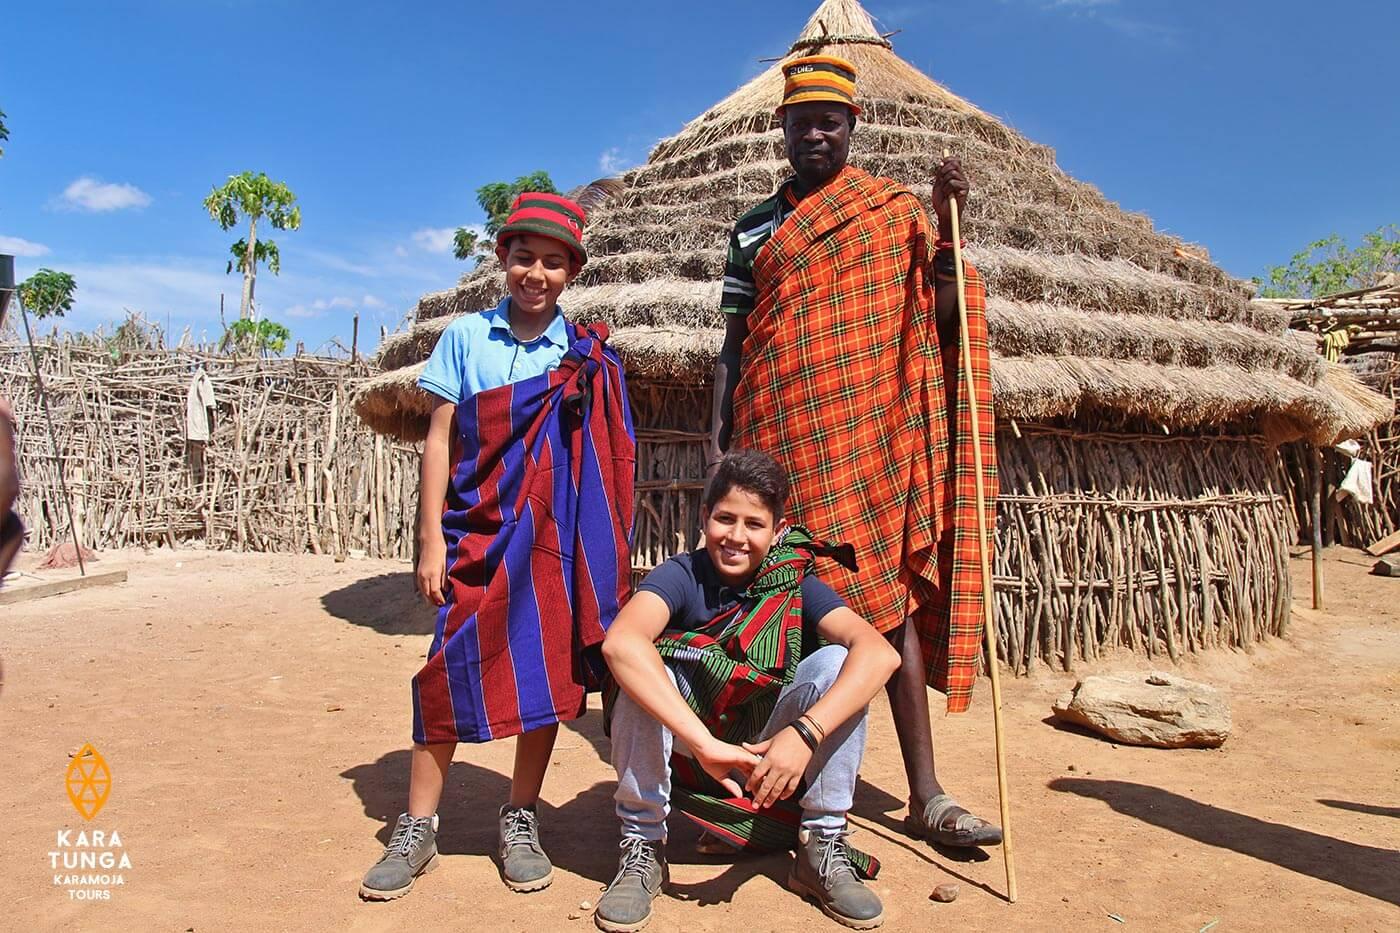 Community tour with Kara-Tunga